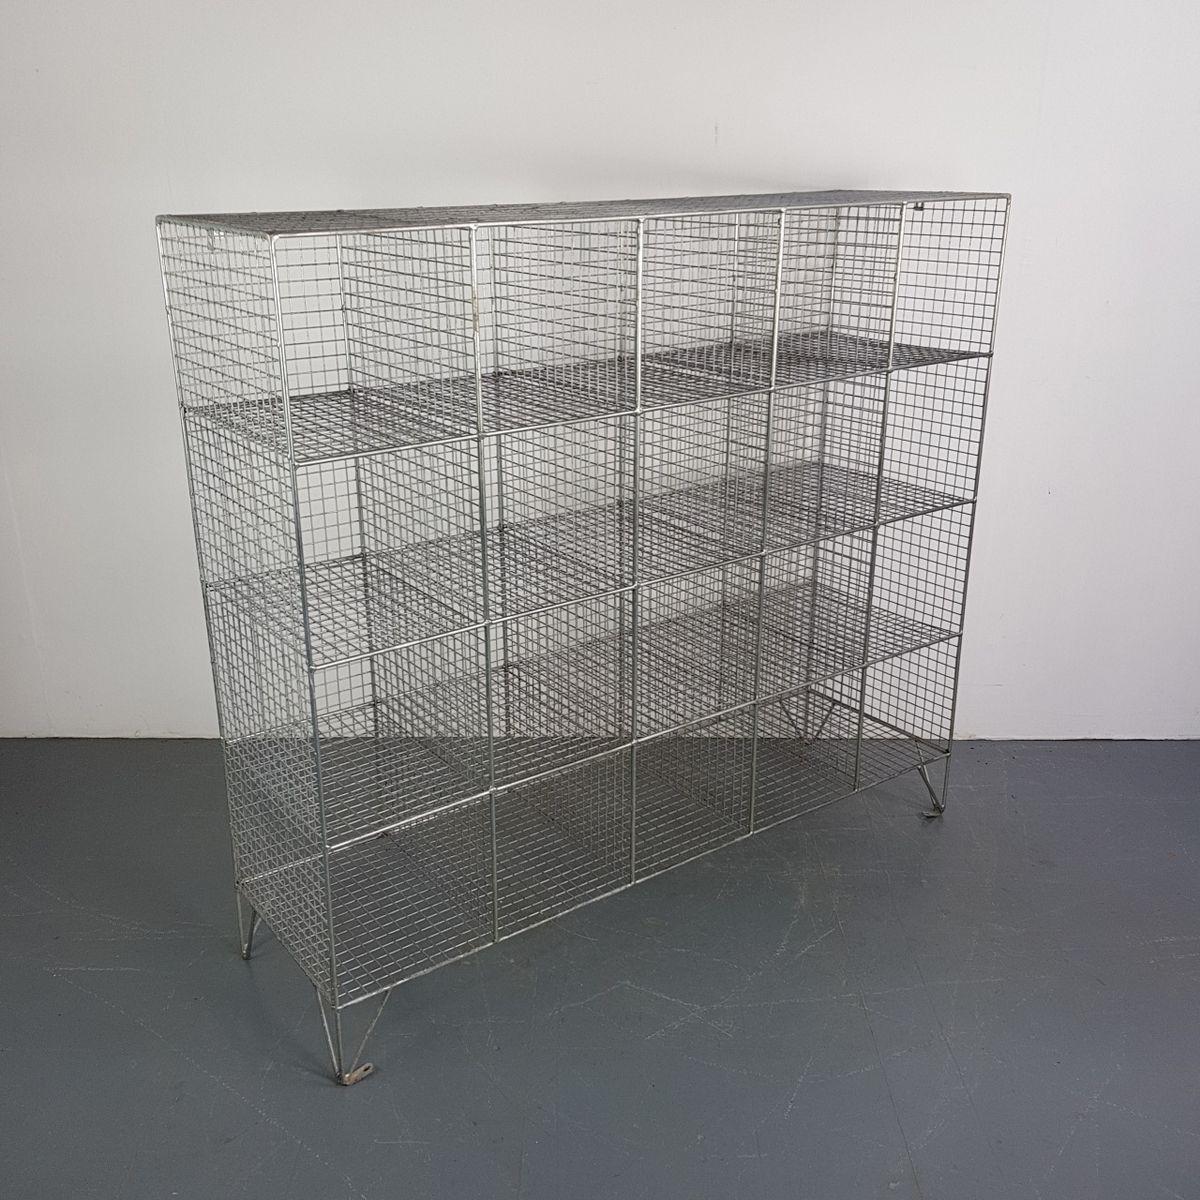 Gemütlich Quadrat Drahtgeflecht Bilder - Der Schaltplan - greigo.com